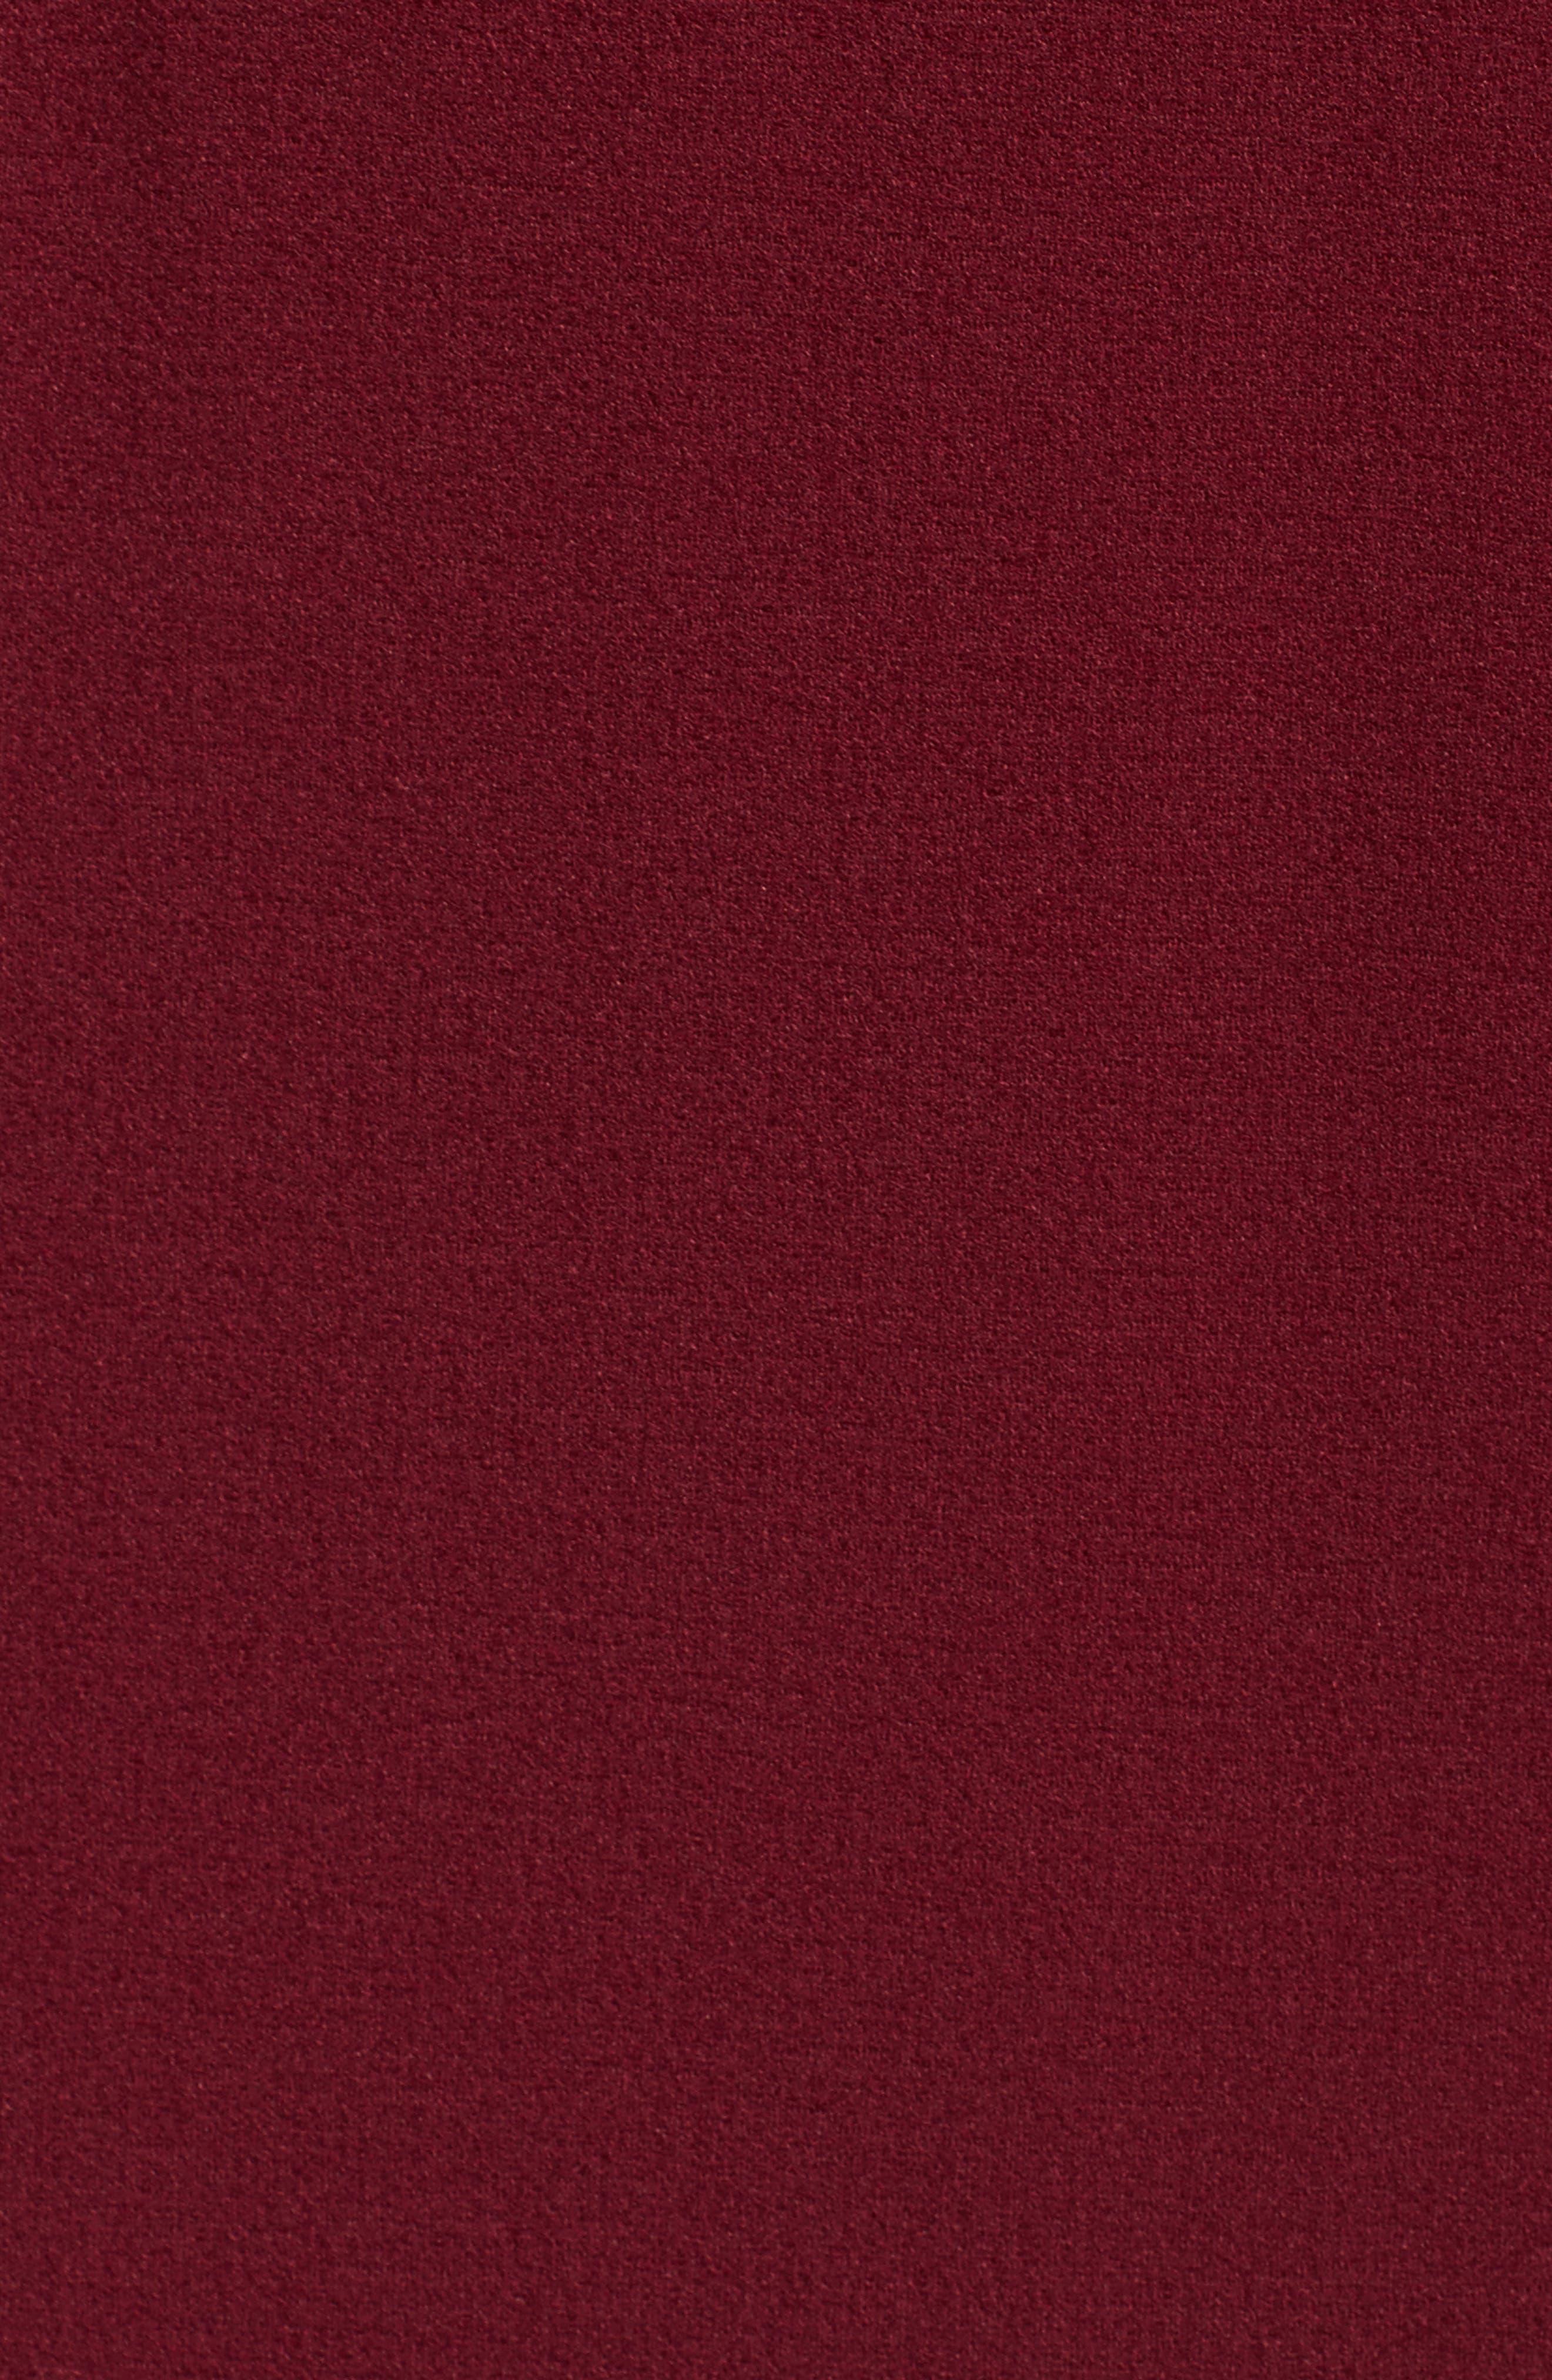 Cold Shoulder Crepe Sheath Dress,                             Alternate thumbnail 10, color,